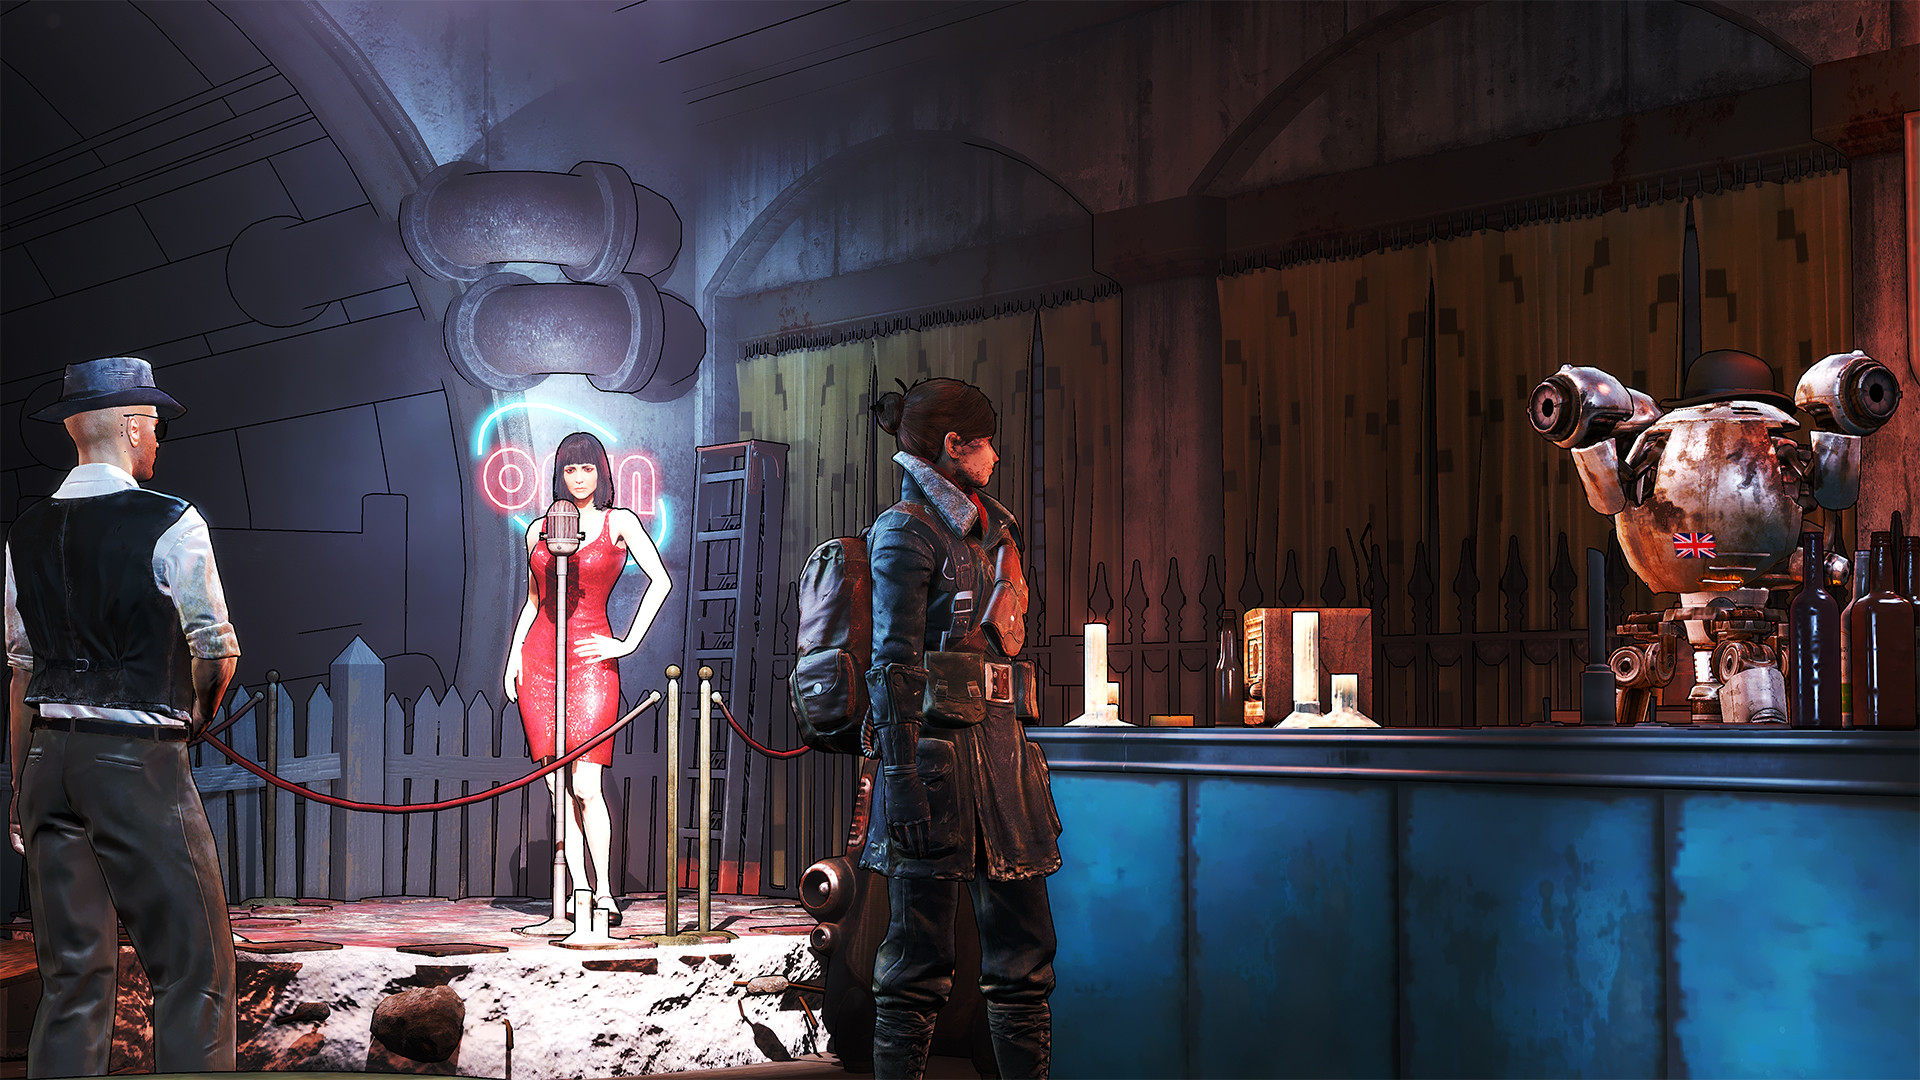 Dragon Skin Girl Wallpaper New Fallout 4 Tweak Adds Borderlands Style Cel Shaded Look